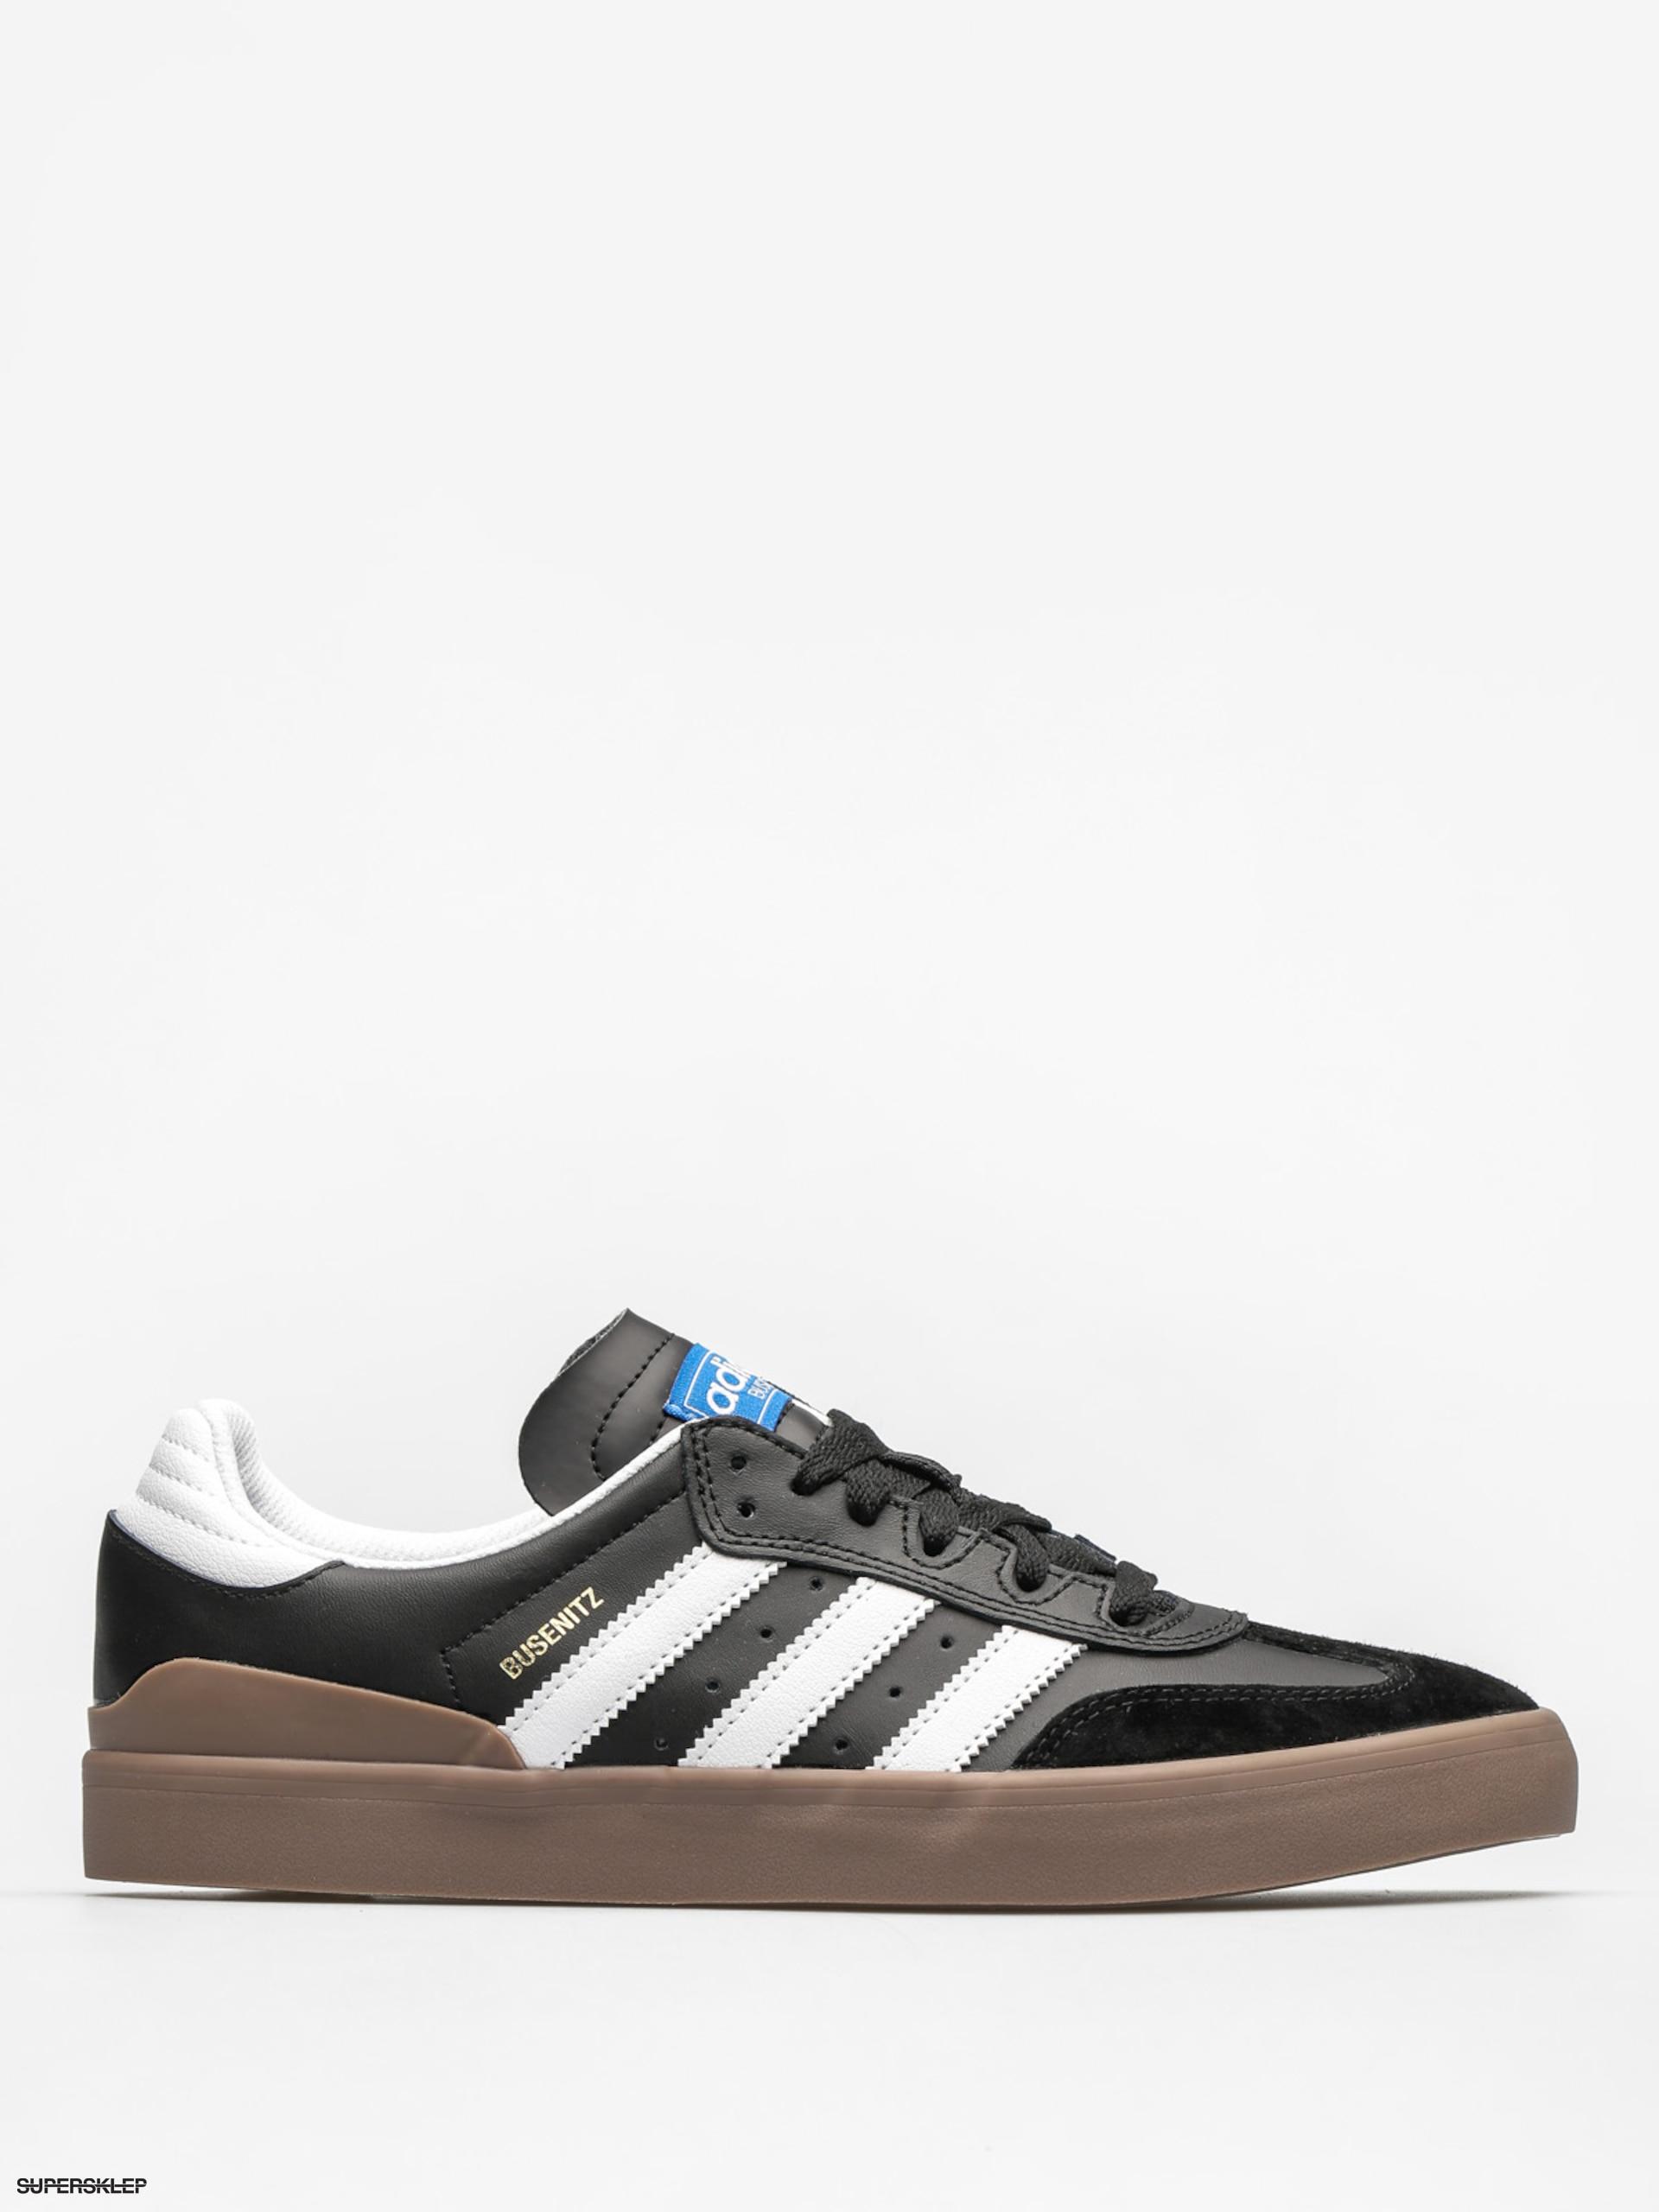 42a6d23e1 Buty adidas Busenitz Vulc Rx (core black/ftwr white/gum5)